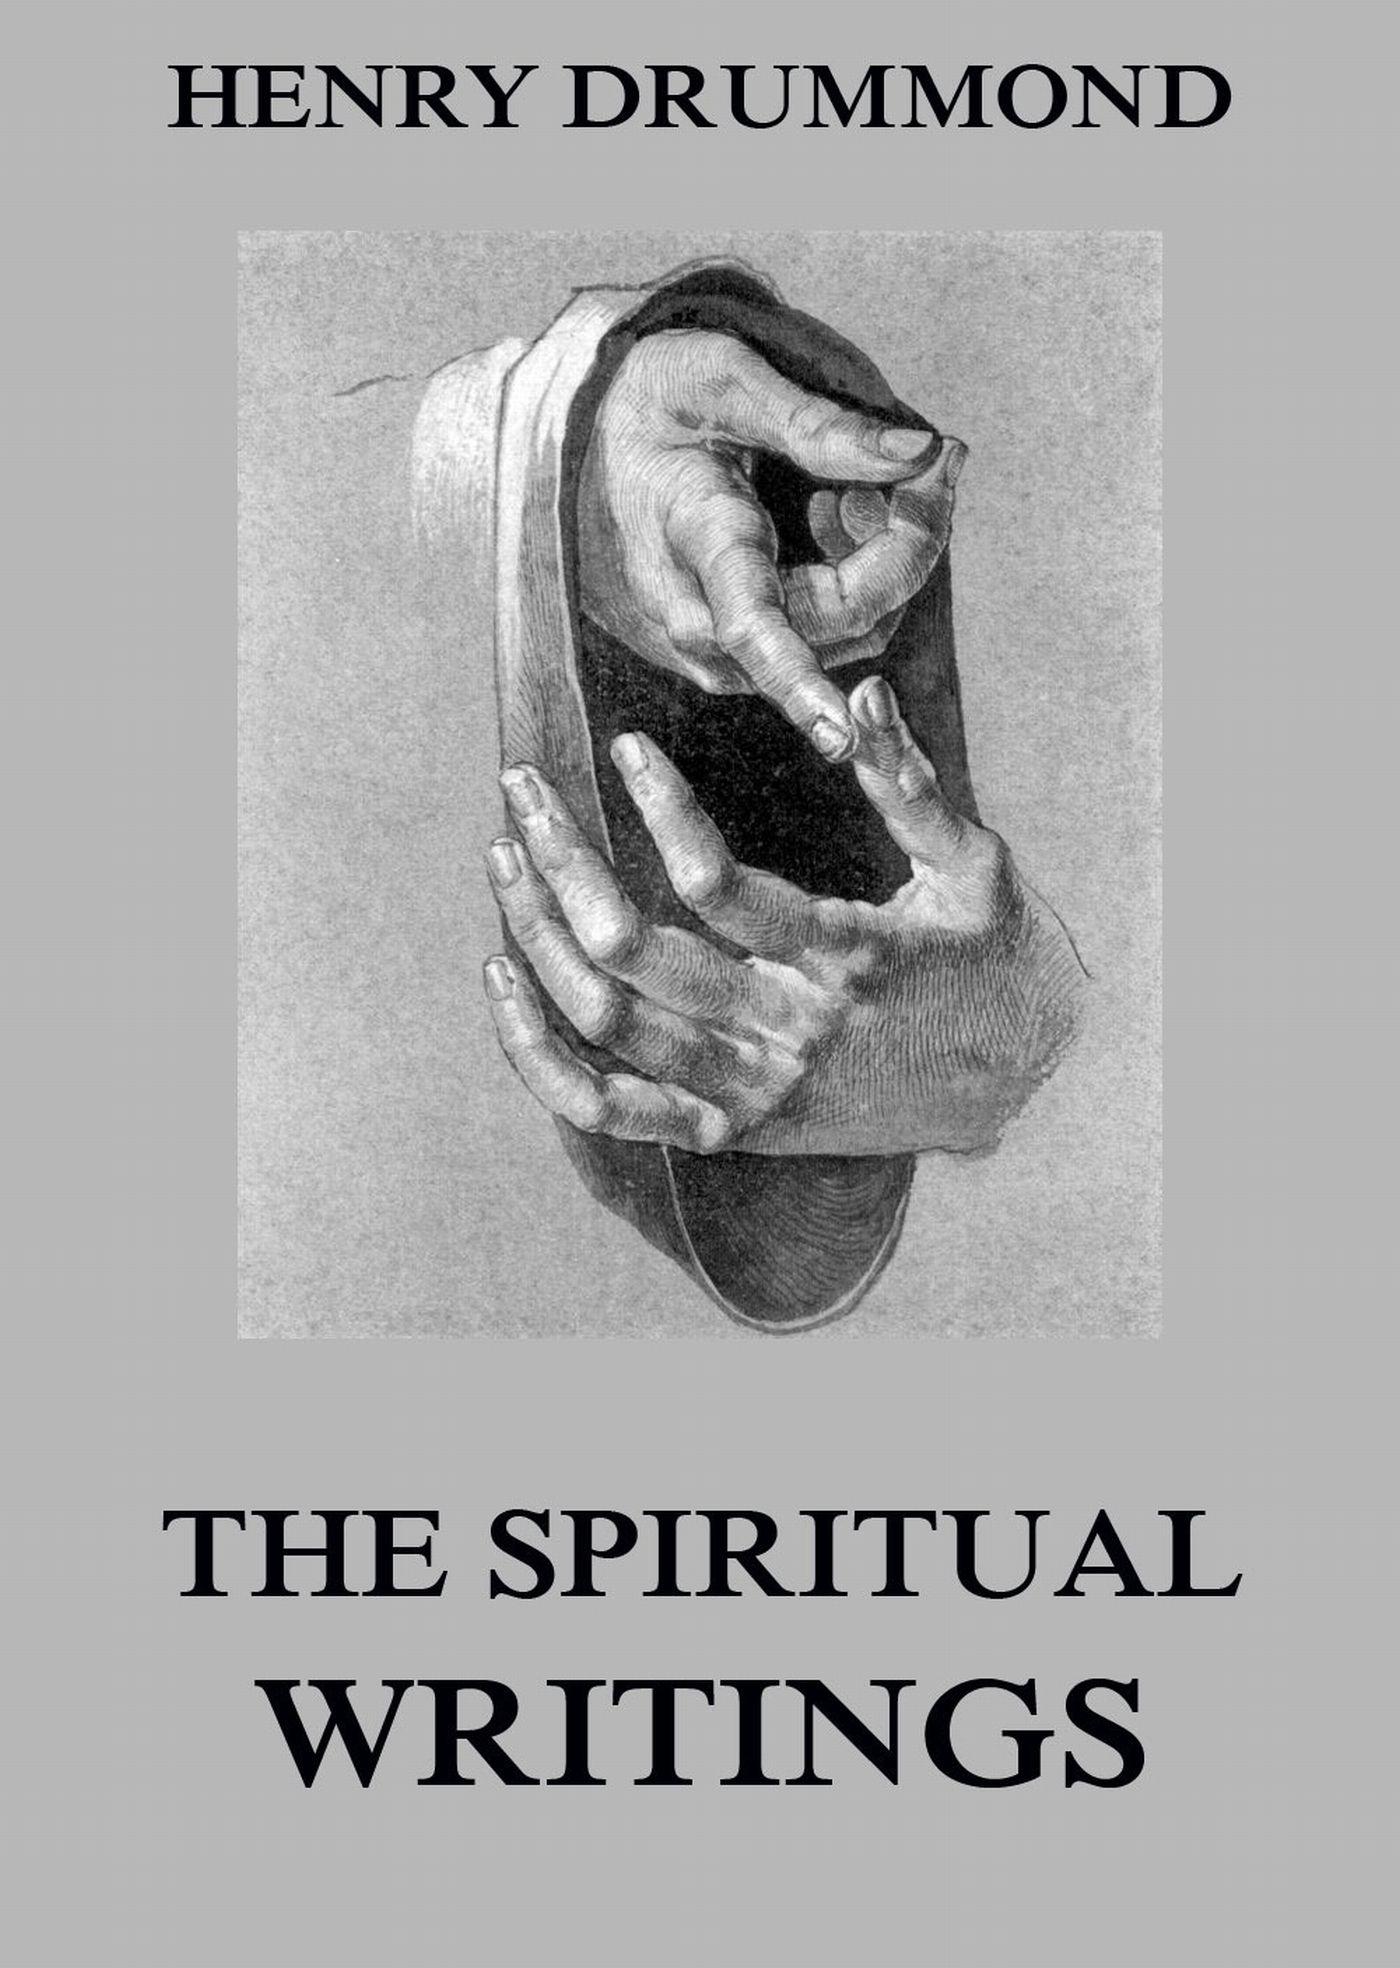 Henry Drummond The Spiritual Writings Of Henry Drummond цена 2017